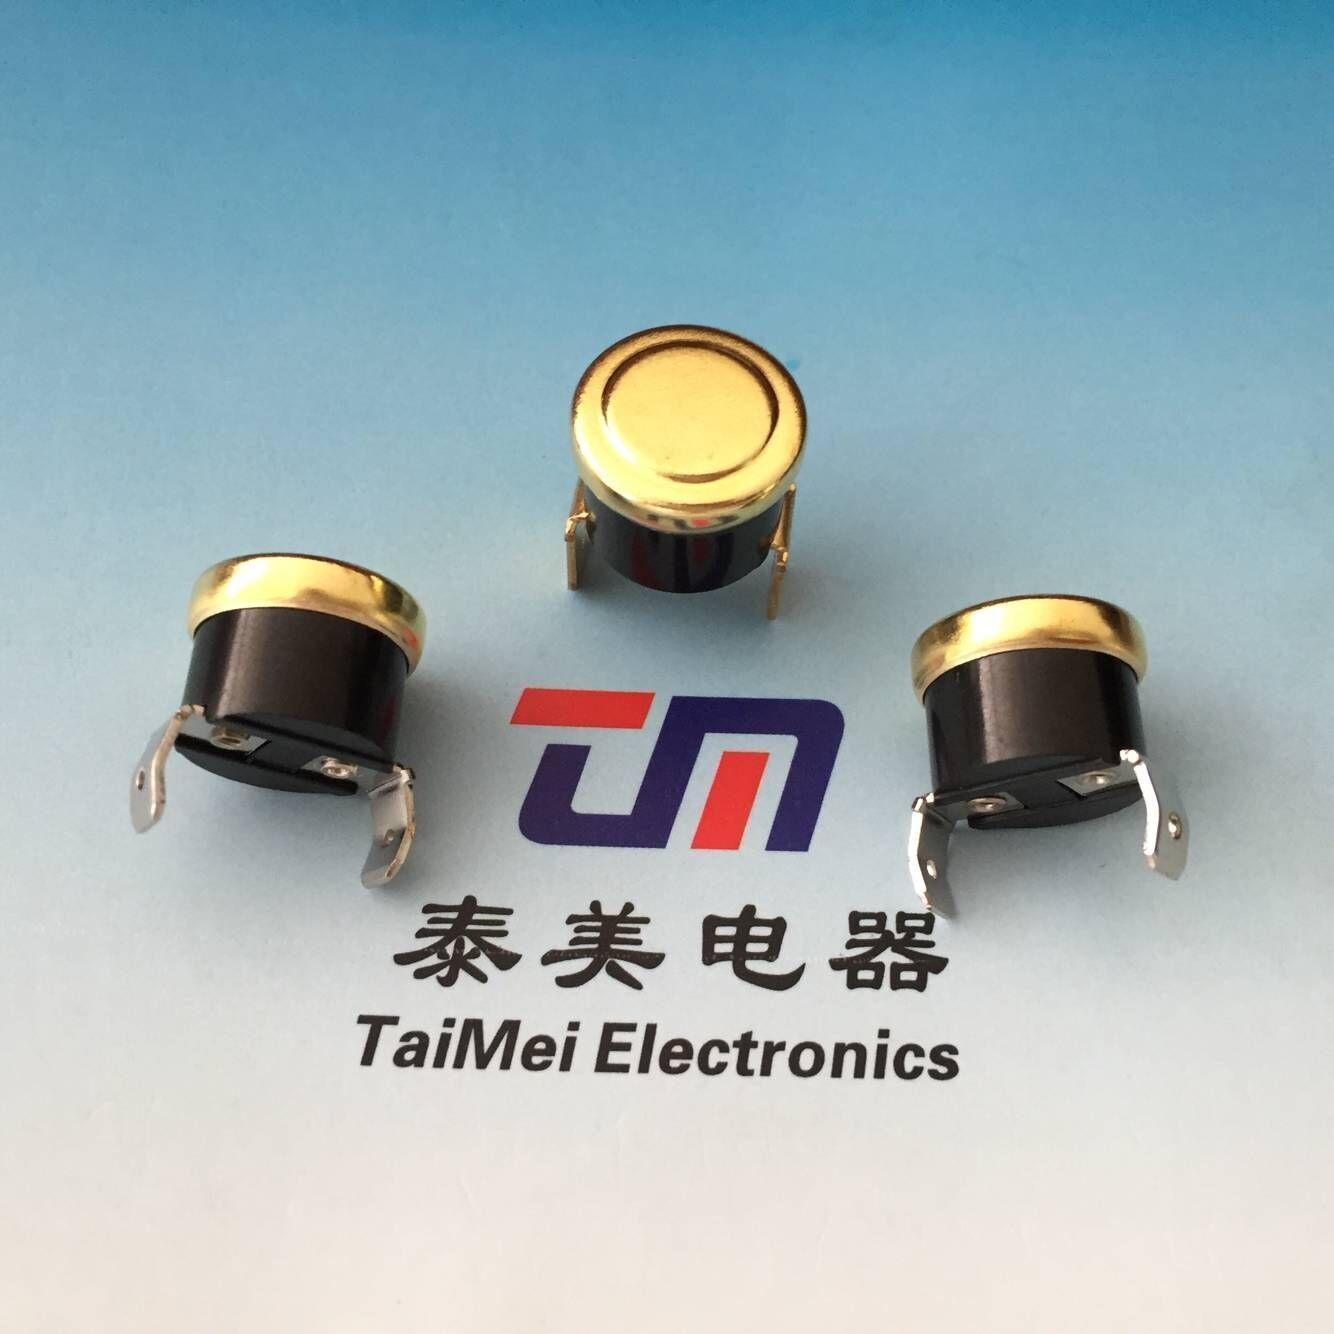 Temperature Limiter Electric Ceramics Auto-Reset Thermostat Washing Machines 2